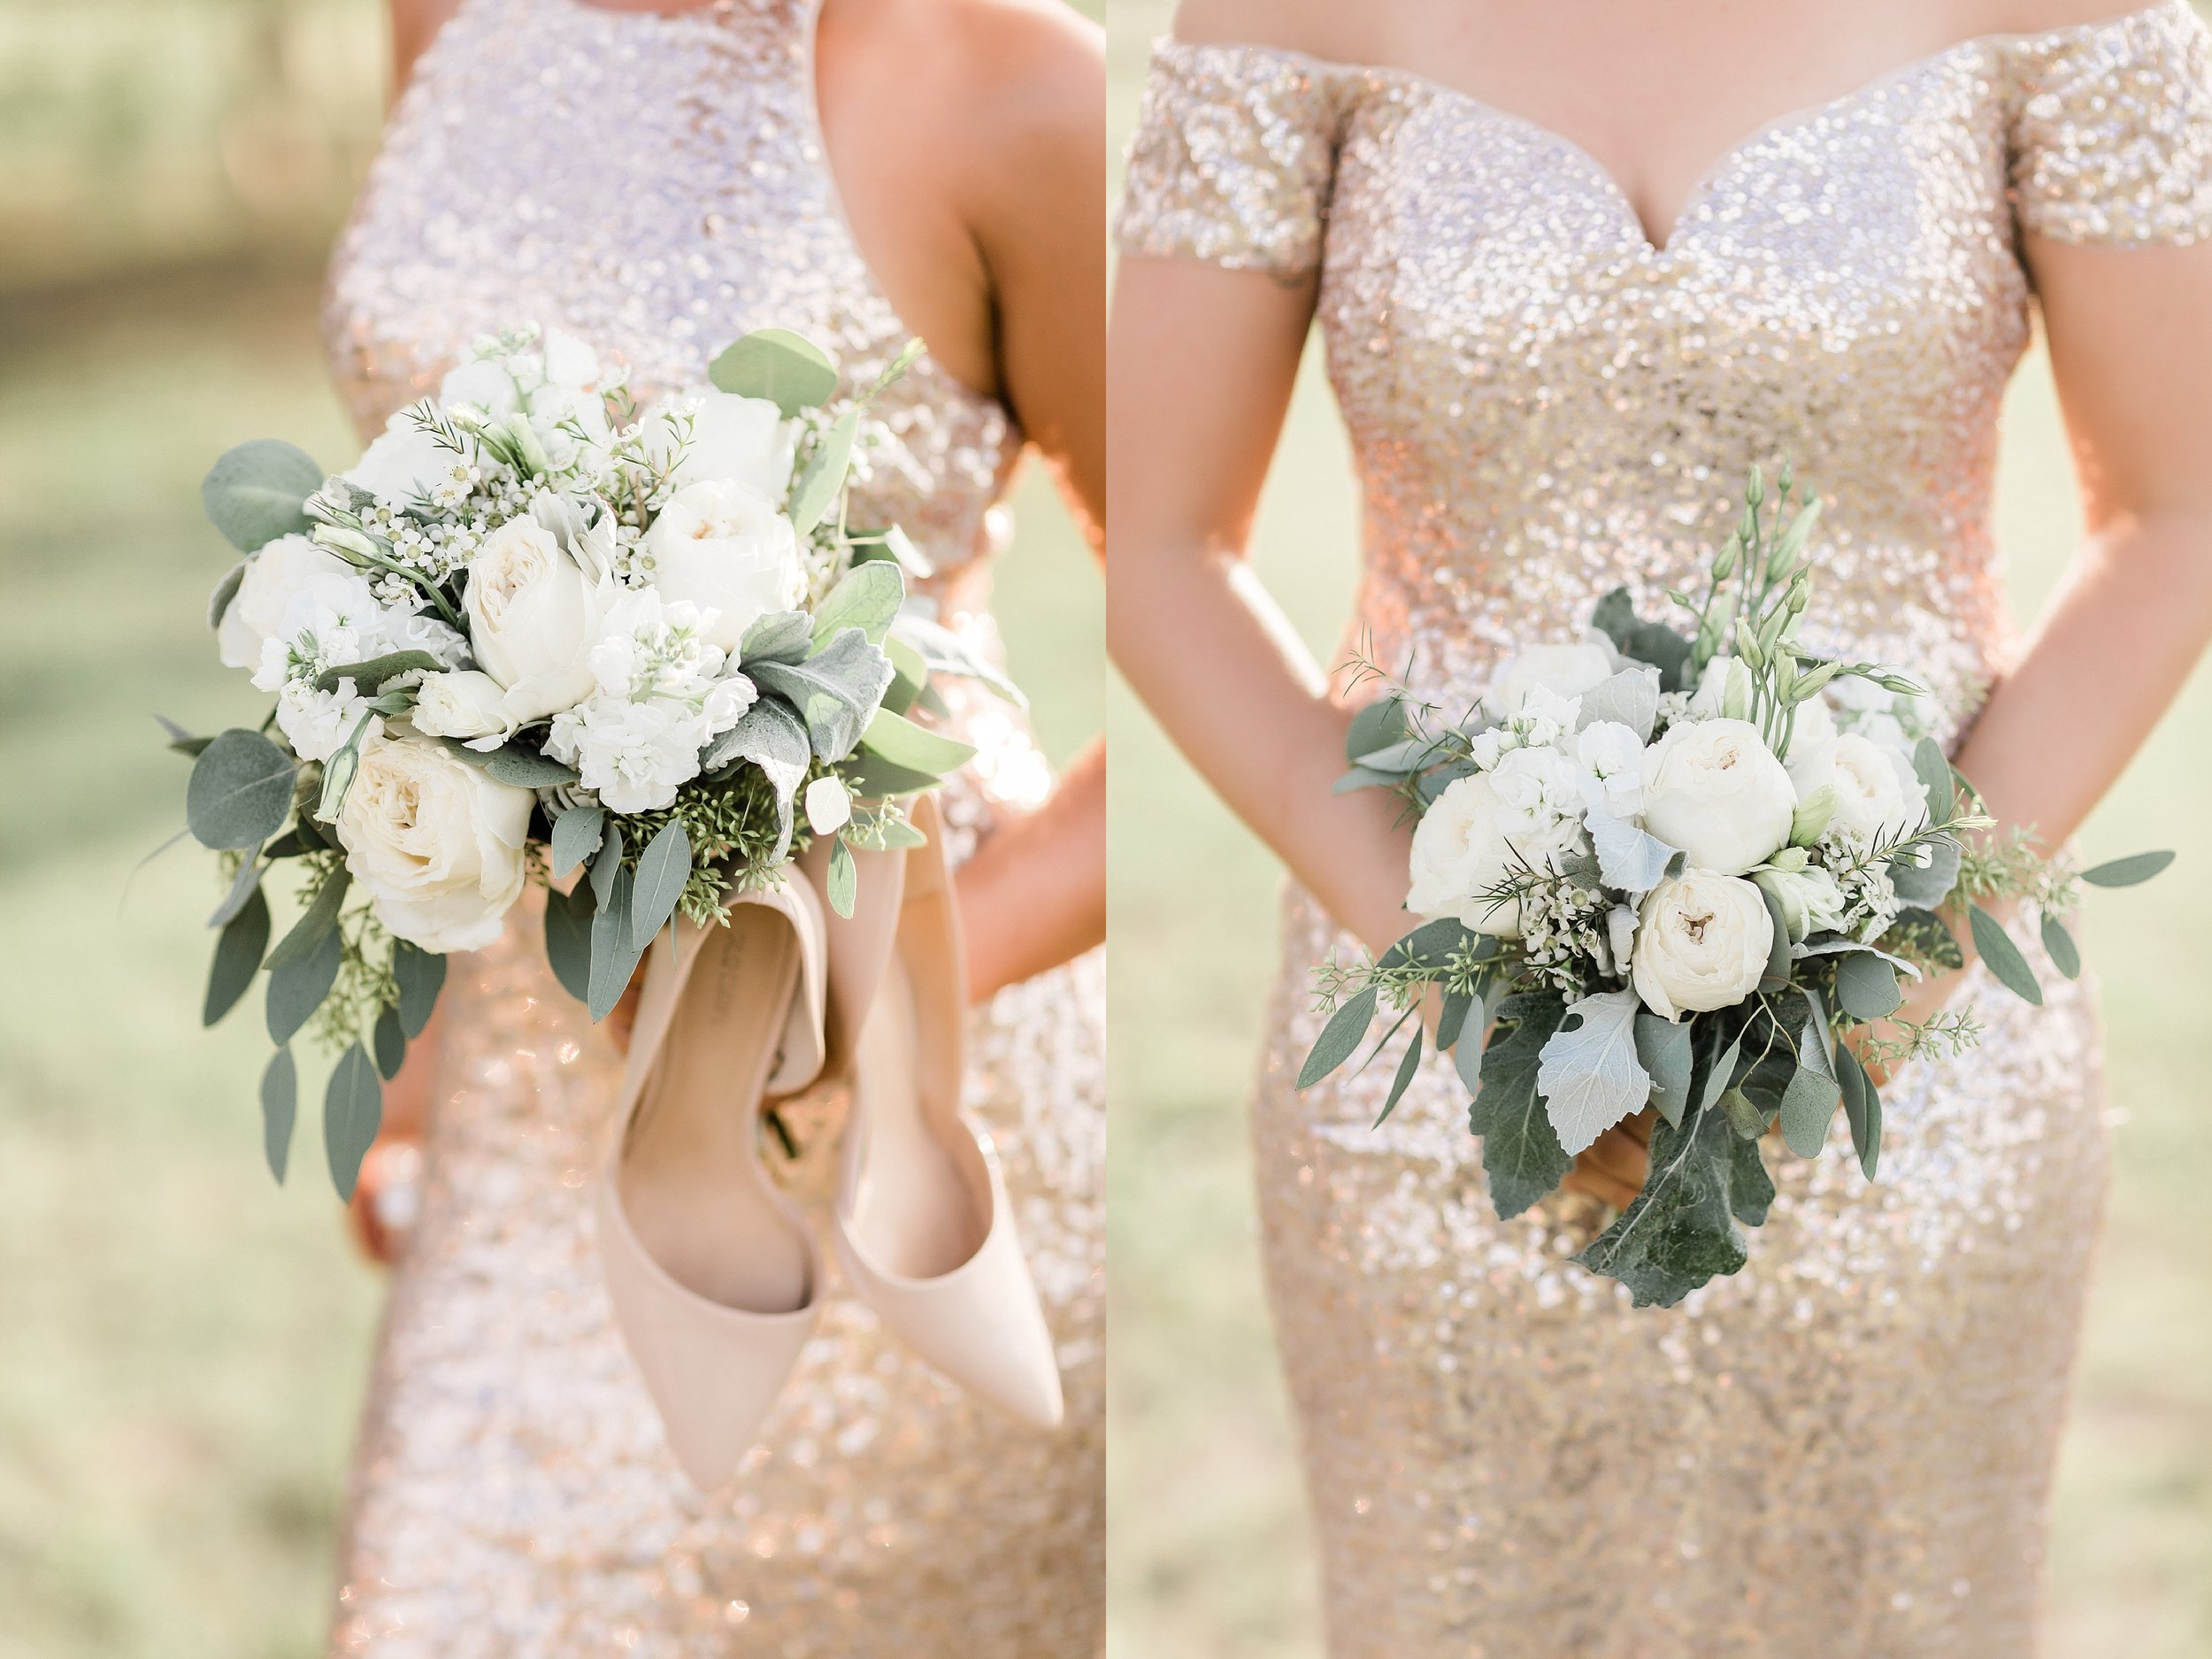 bailey-and-carl-coyote-ranch-resort-wedding-photographer-wichita-falls-texas-destination-wedding-0040.jpg